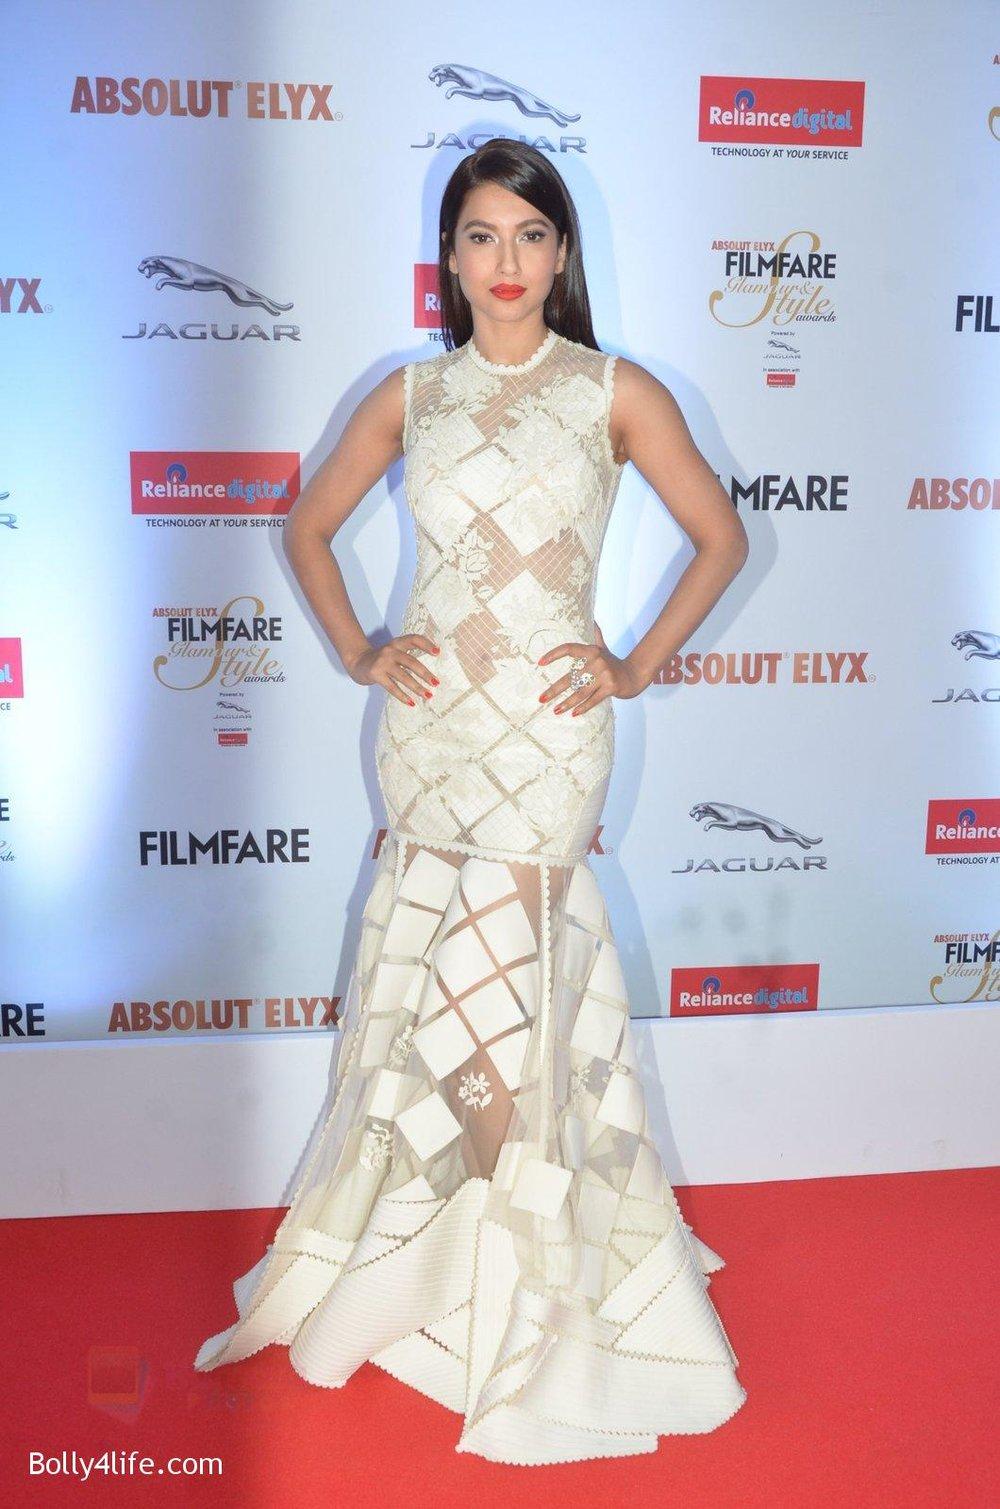 Gauhar-Khan-at-Filmfare-Glamour-Style-Awards-2016-in-Mumbai-on-15th-Oct-2016-1138.jpg